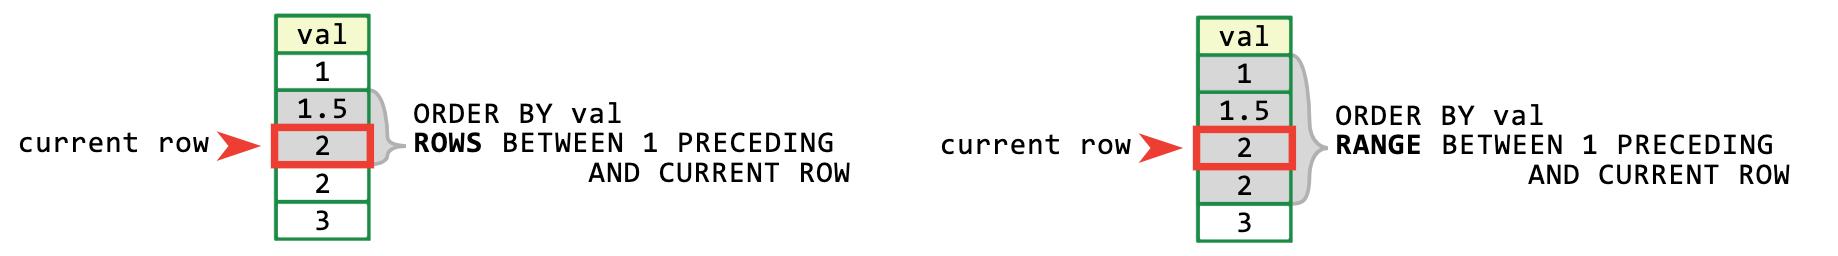 Figure 2. Rows 窗口和 Range 窗口